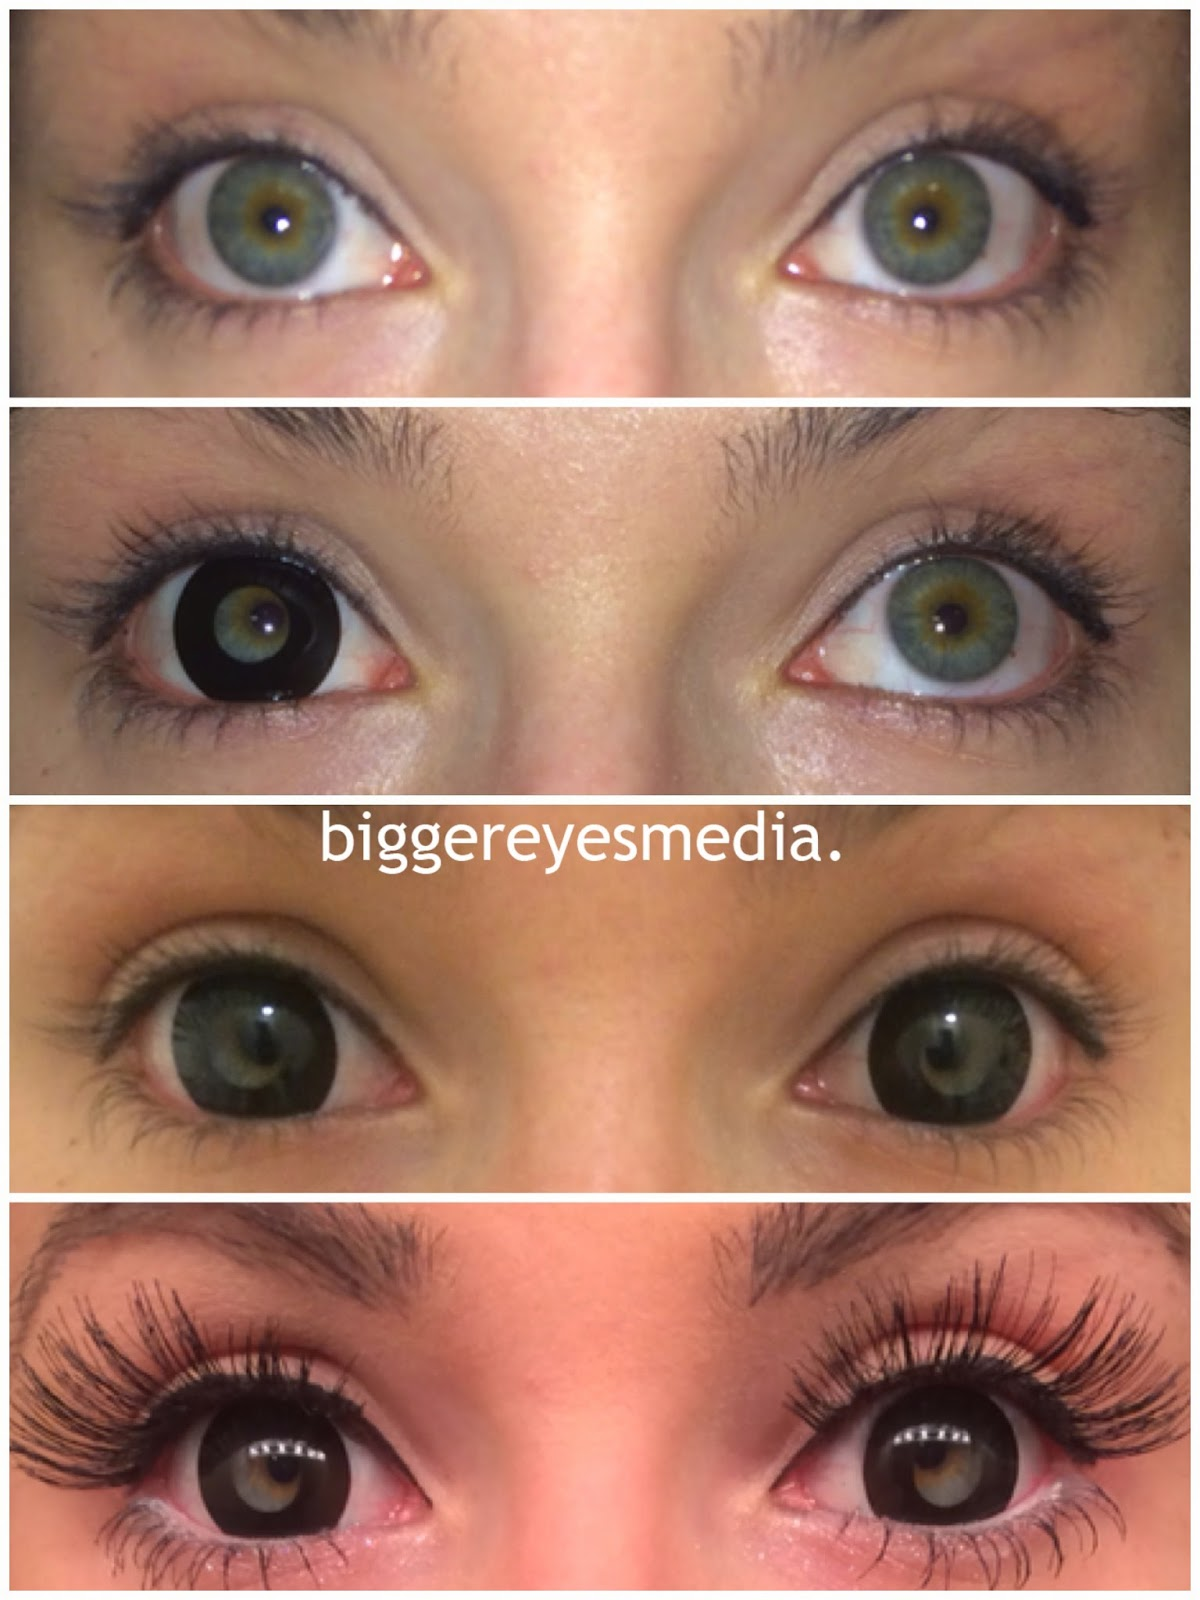 BIGGER eyes media.: Mini Sclera Phantasee Black Titan Lens ...   1200 x 1600 jpeg 186kB